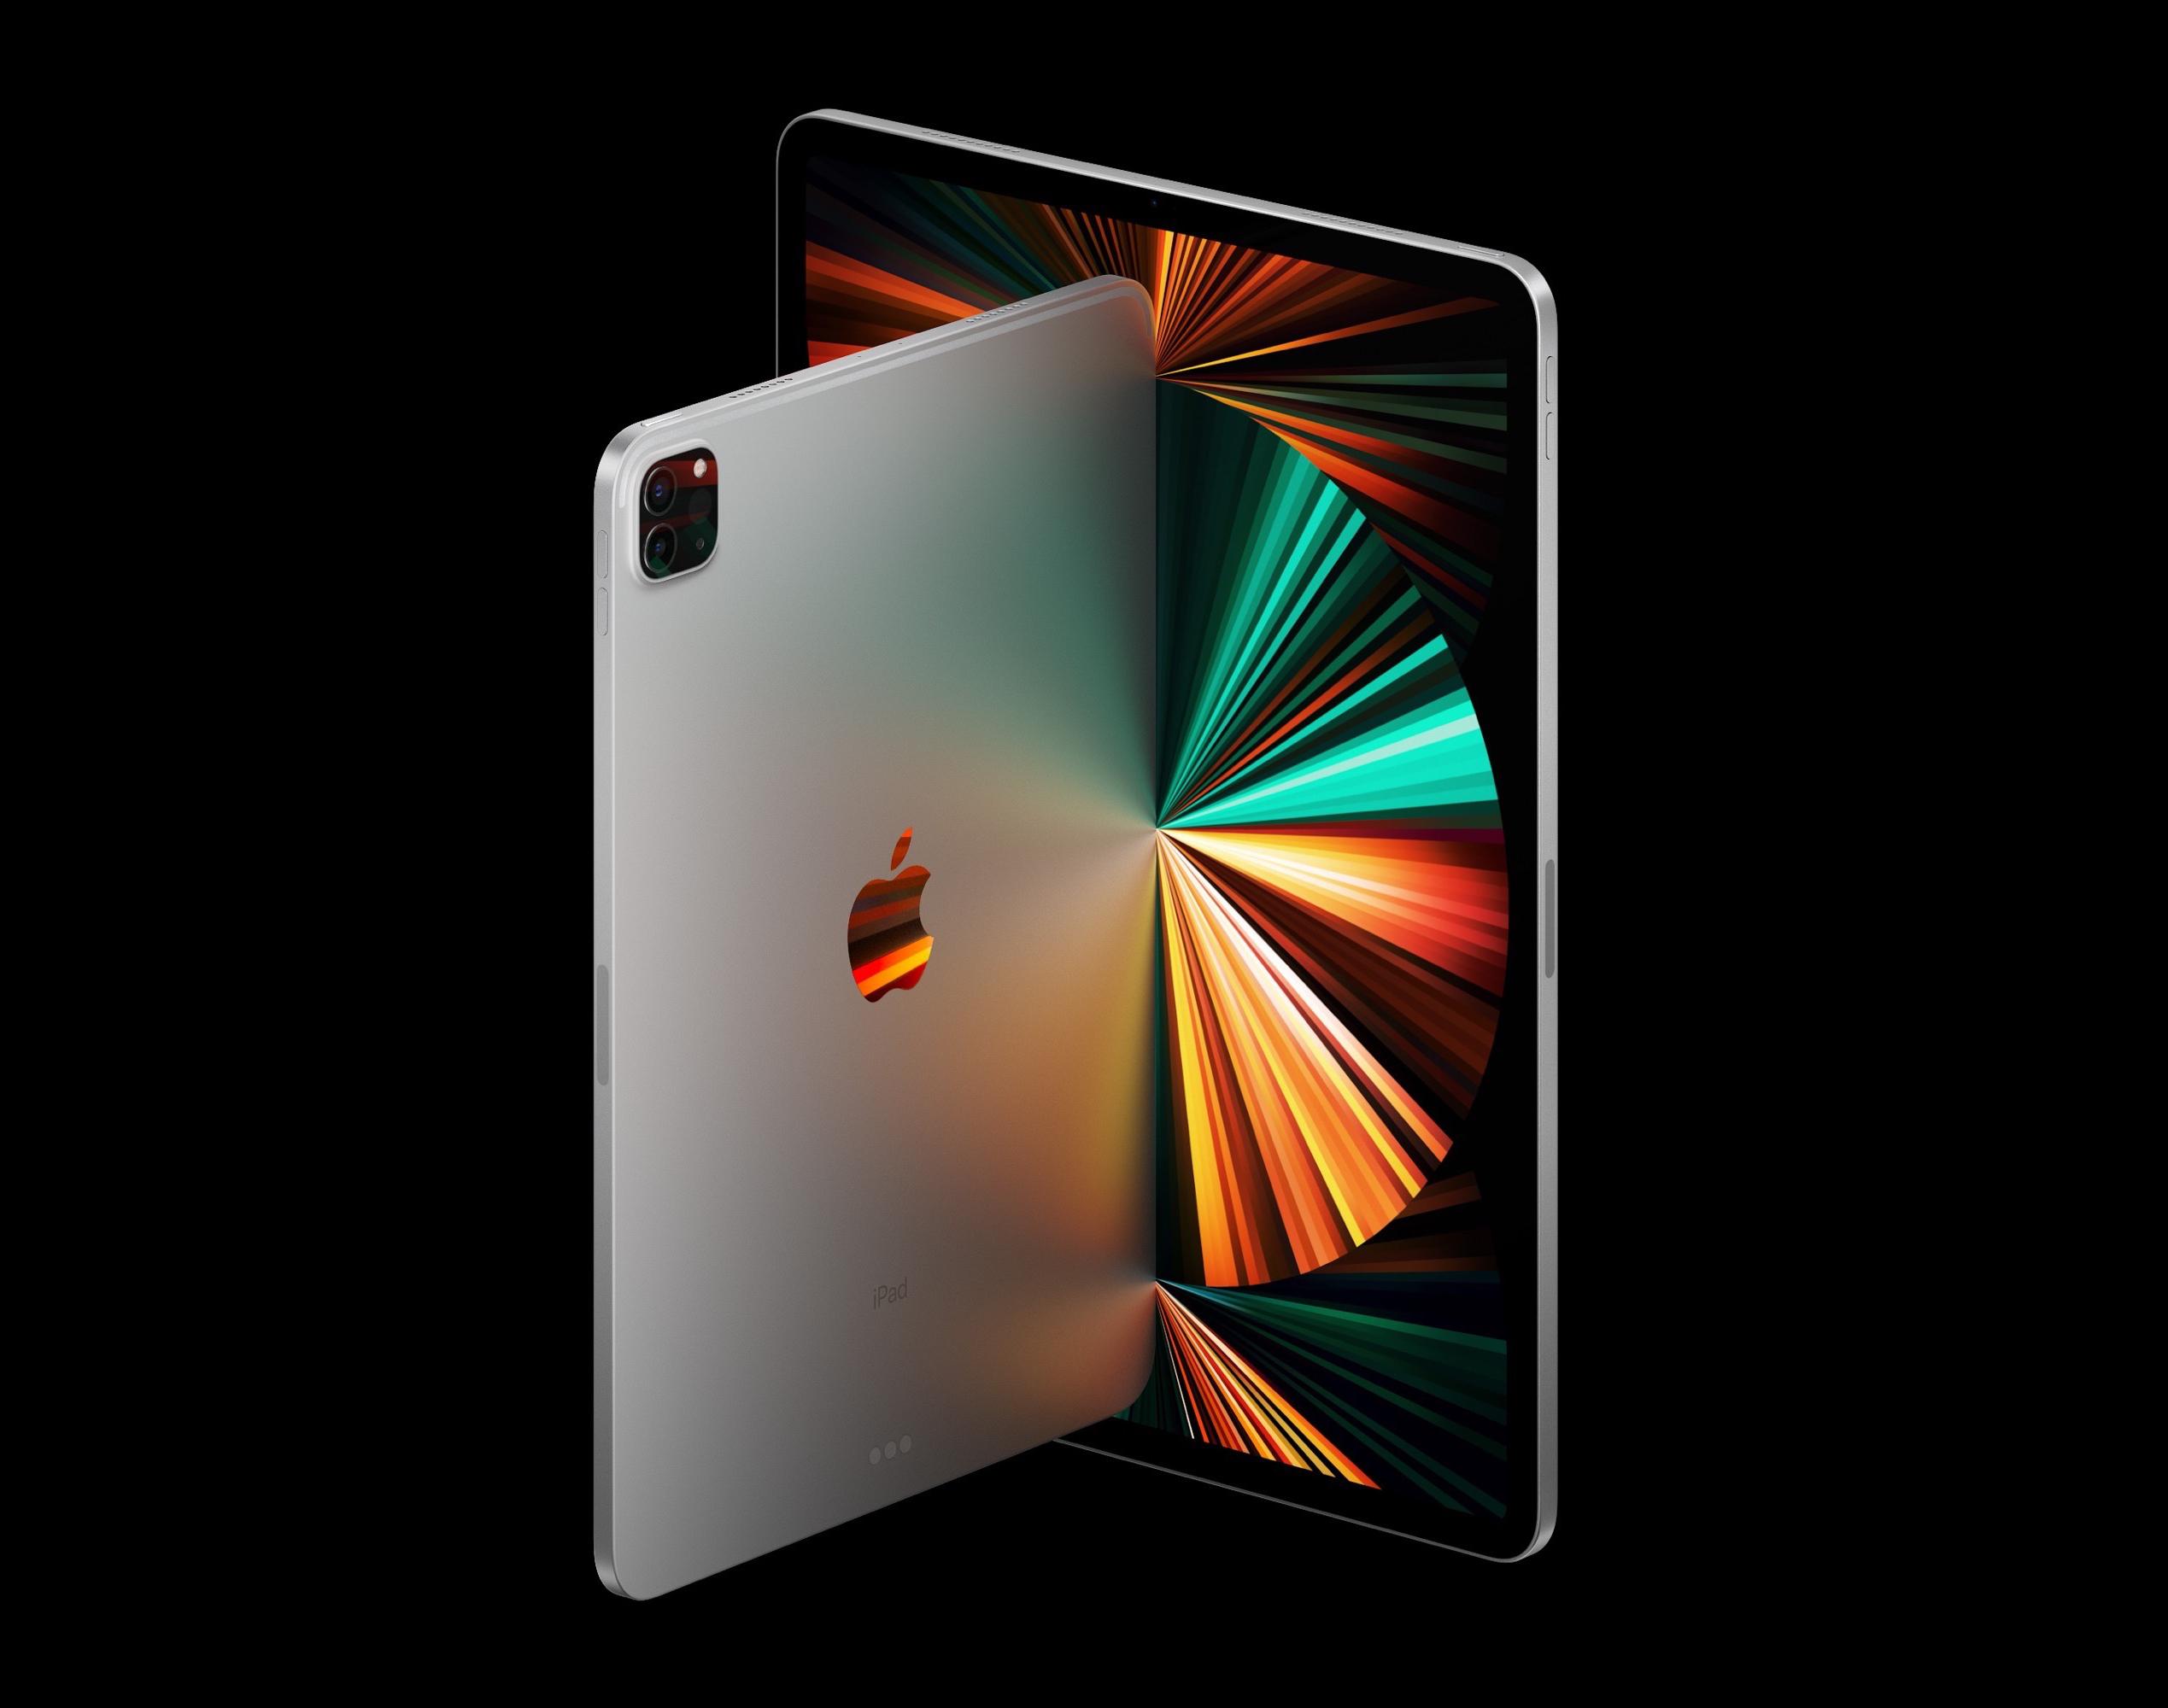 Apple enthüllt das iPad Pro 2021 mit Mini-LED-Display, M1 ...